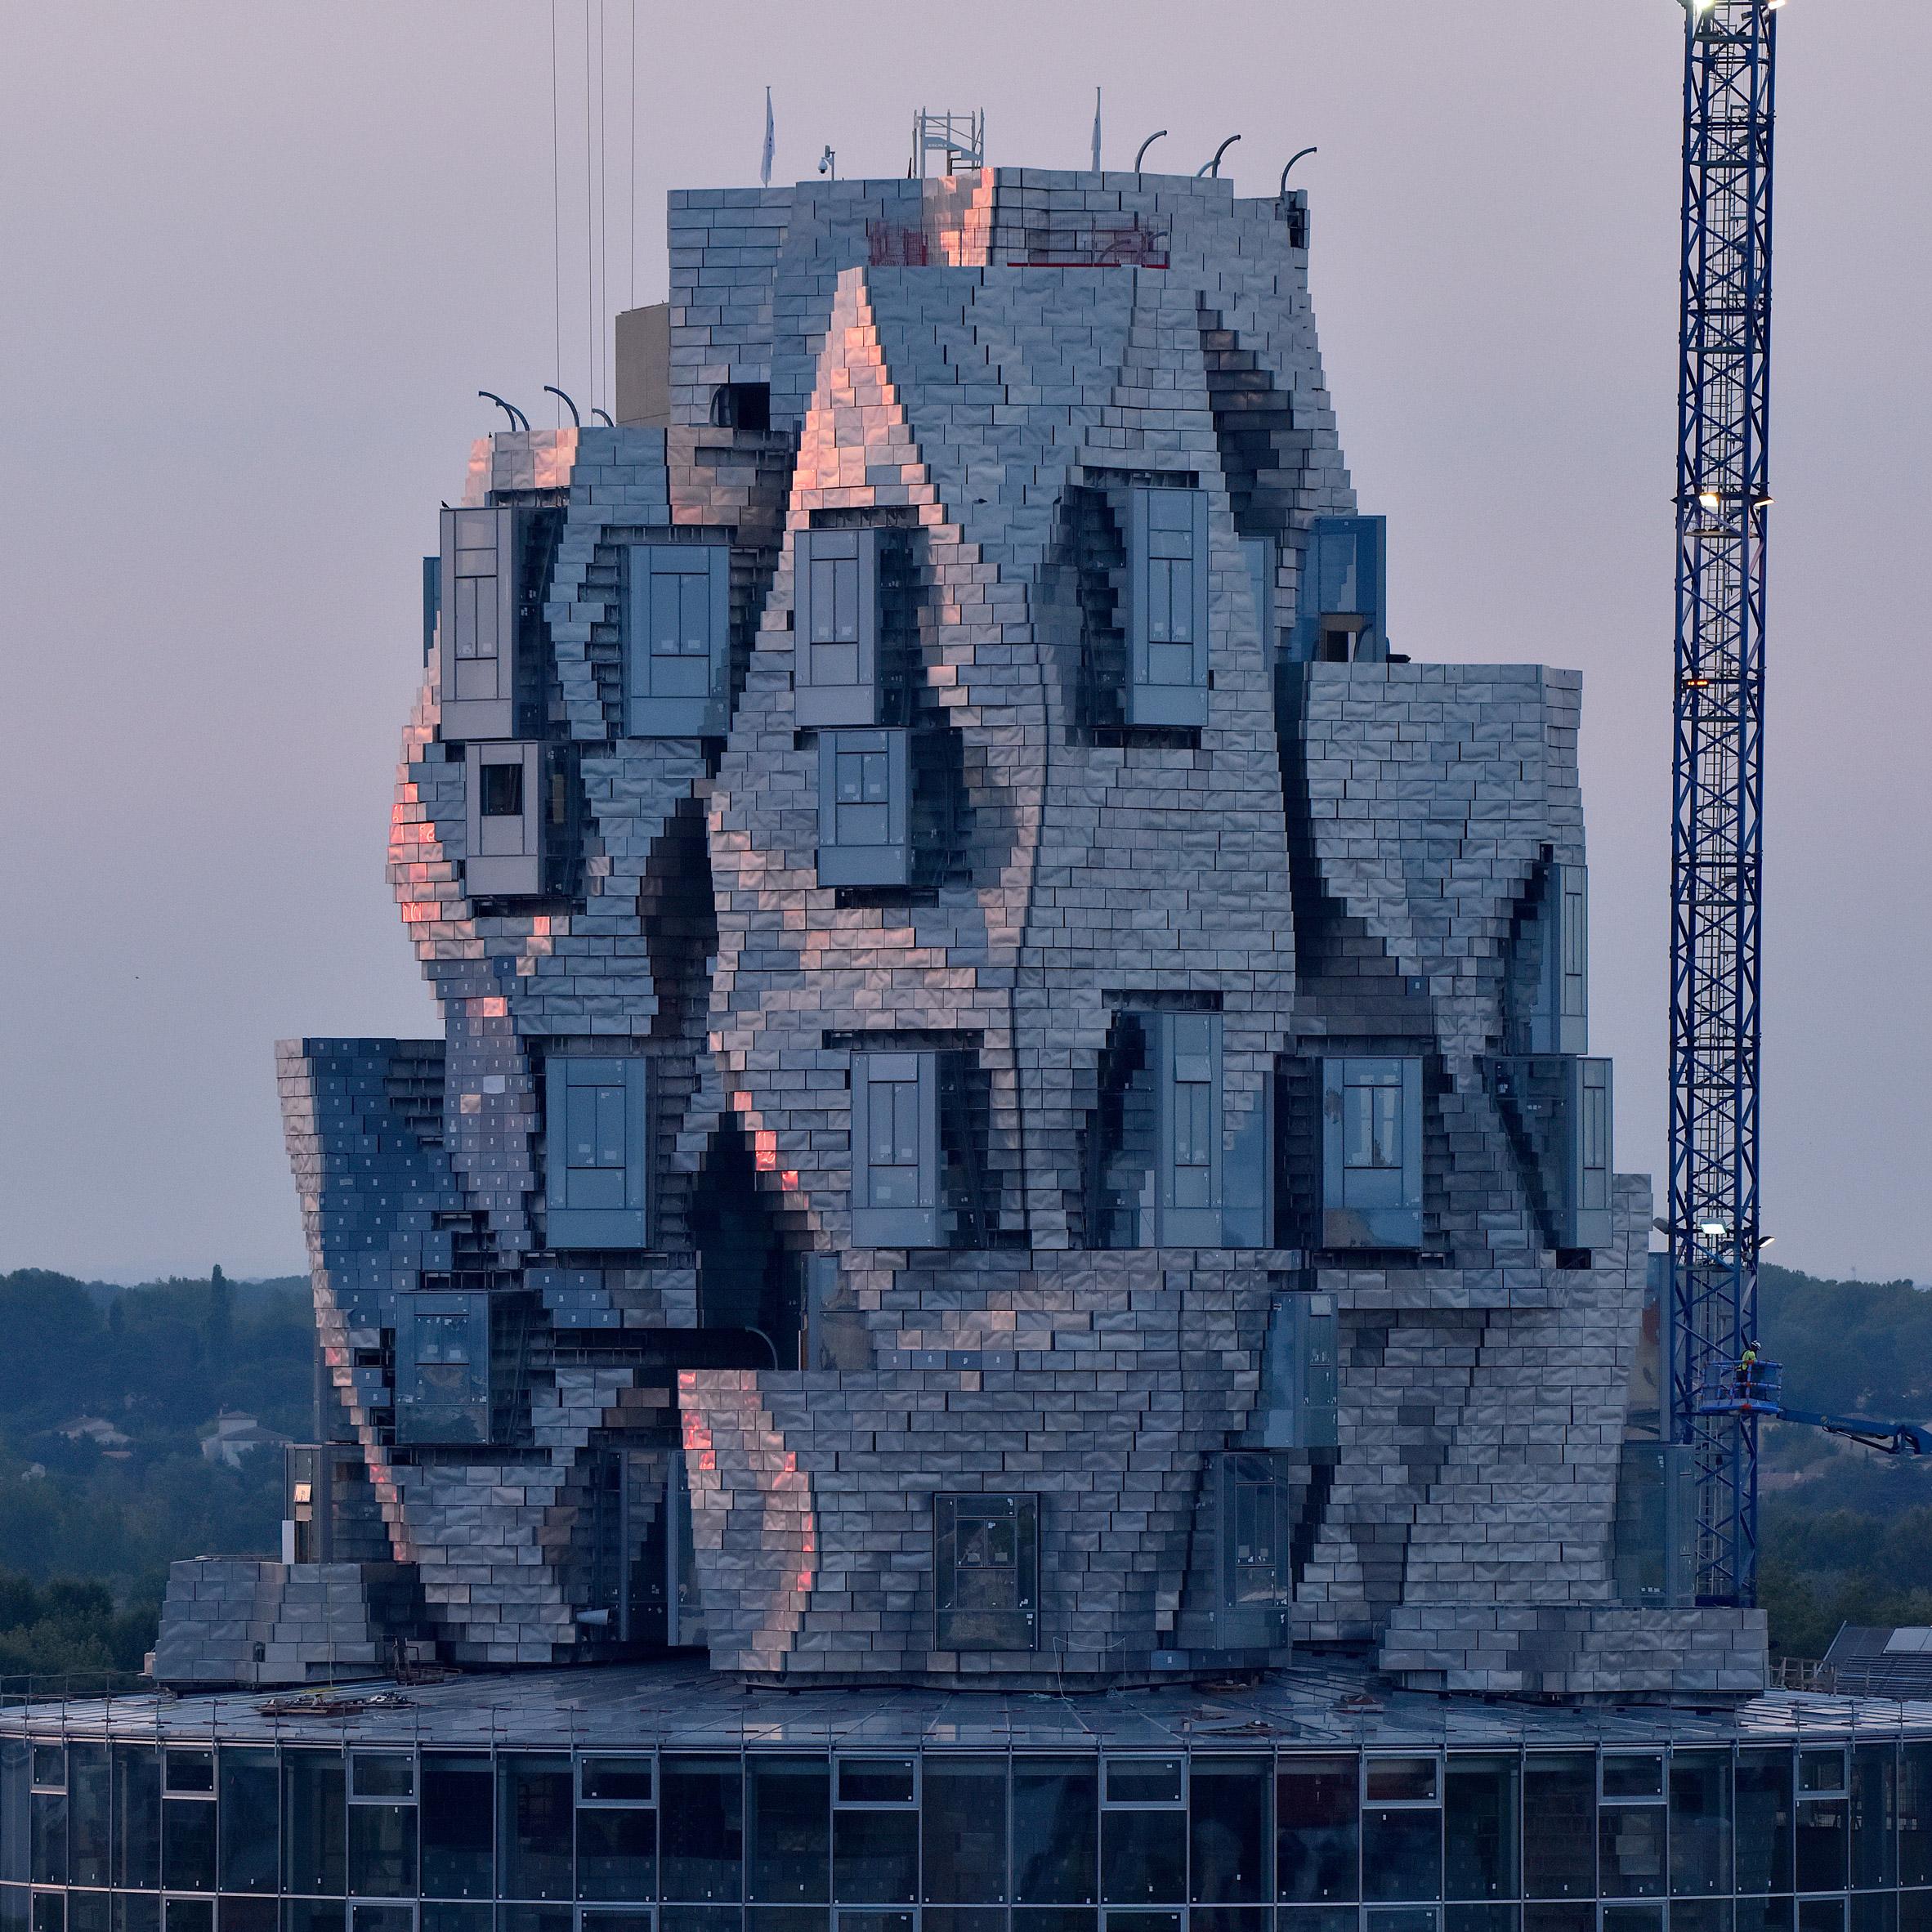 Atelier D Architecture Hervé Vincent frank gehry's aluminium-clad luma arles tower takes shape in